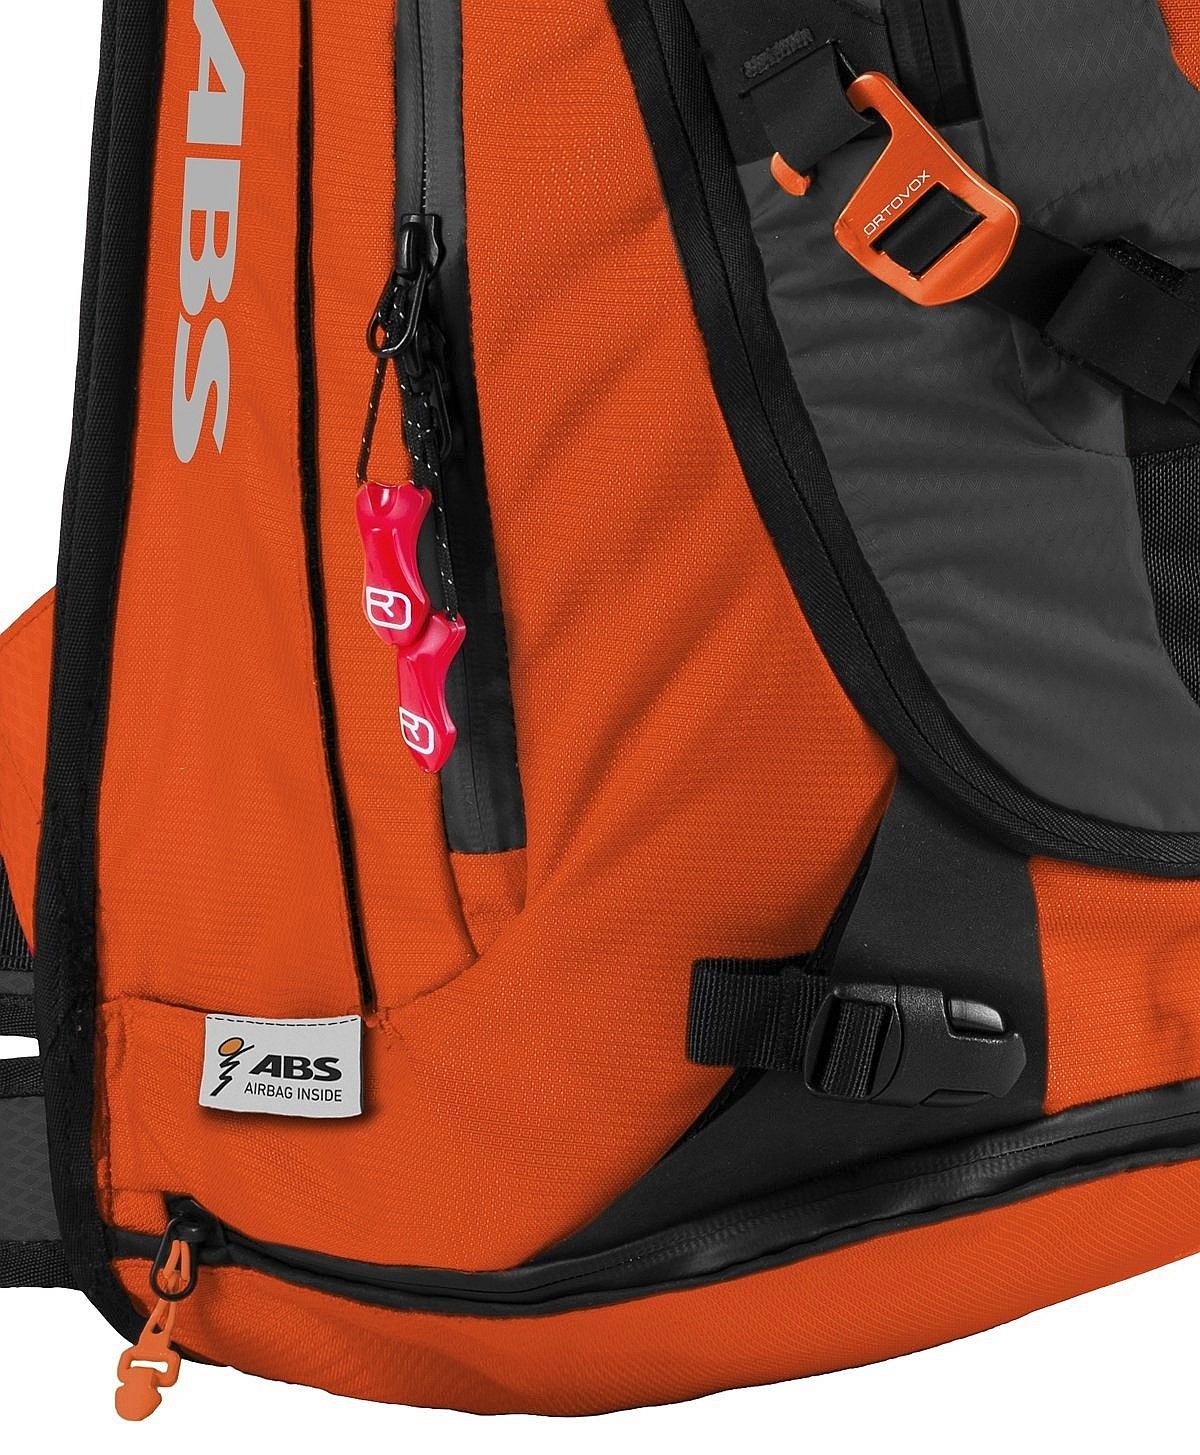 6b9f8380489 ... batoh Ortovox Tour 32+7 ABS Incl. M.A.S.S. - Crazy Orange ...